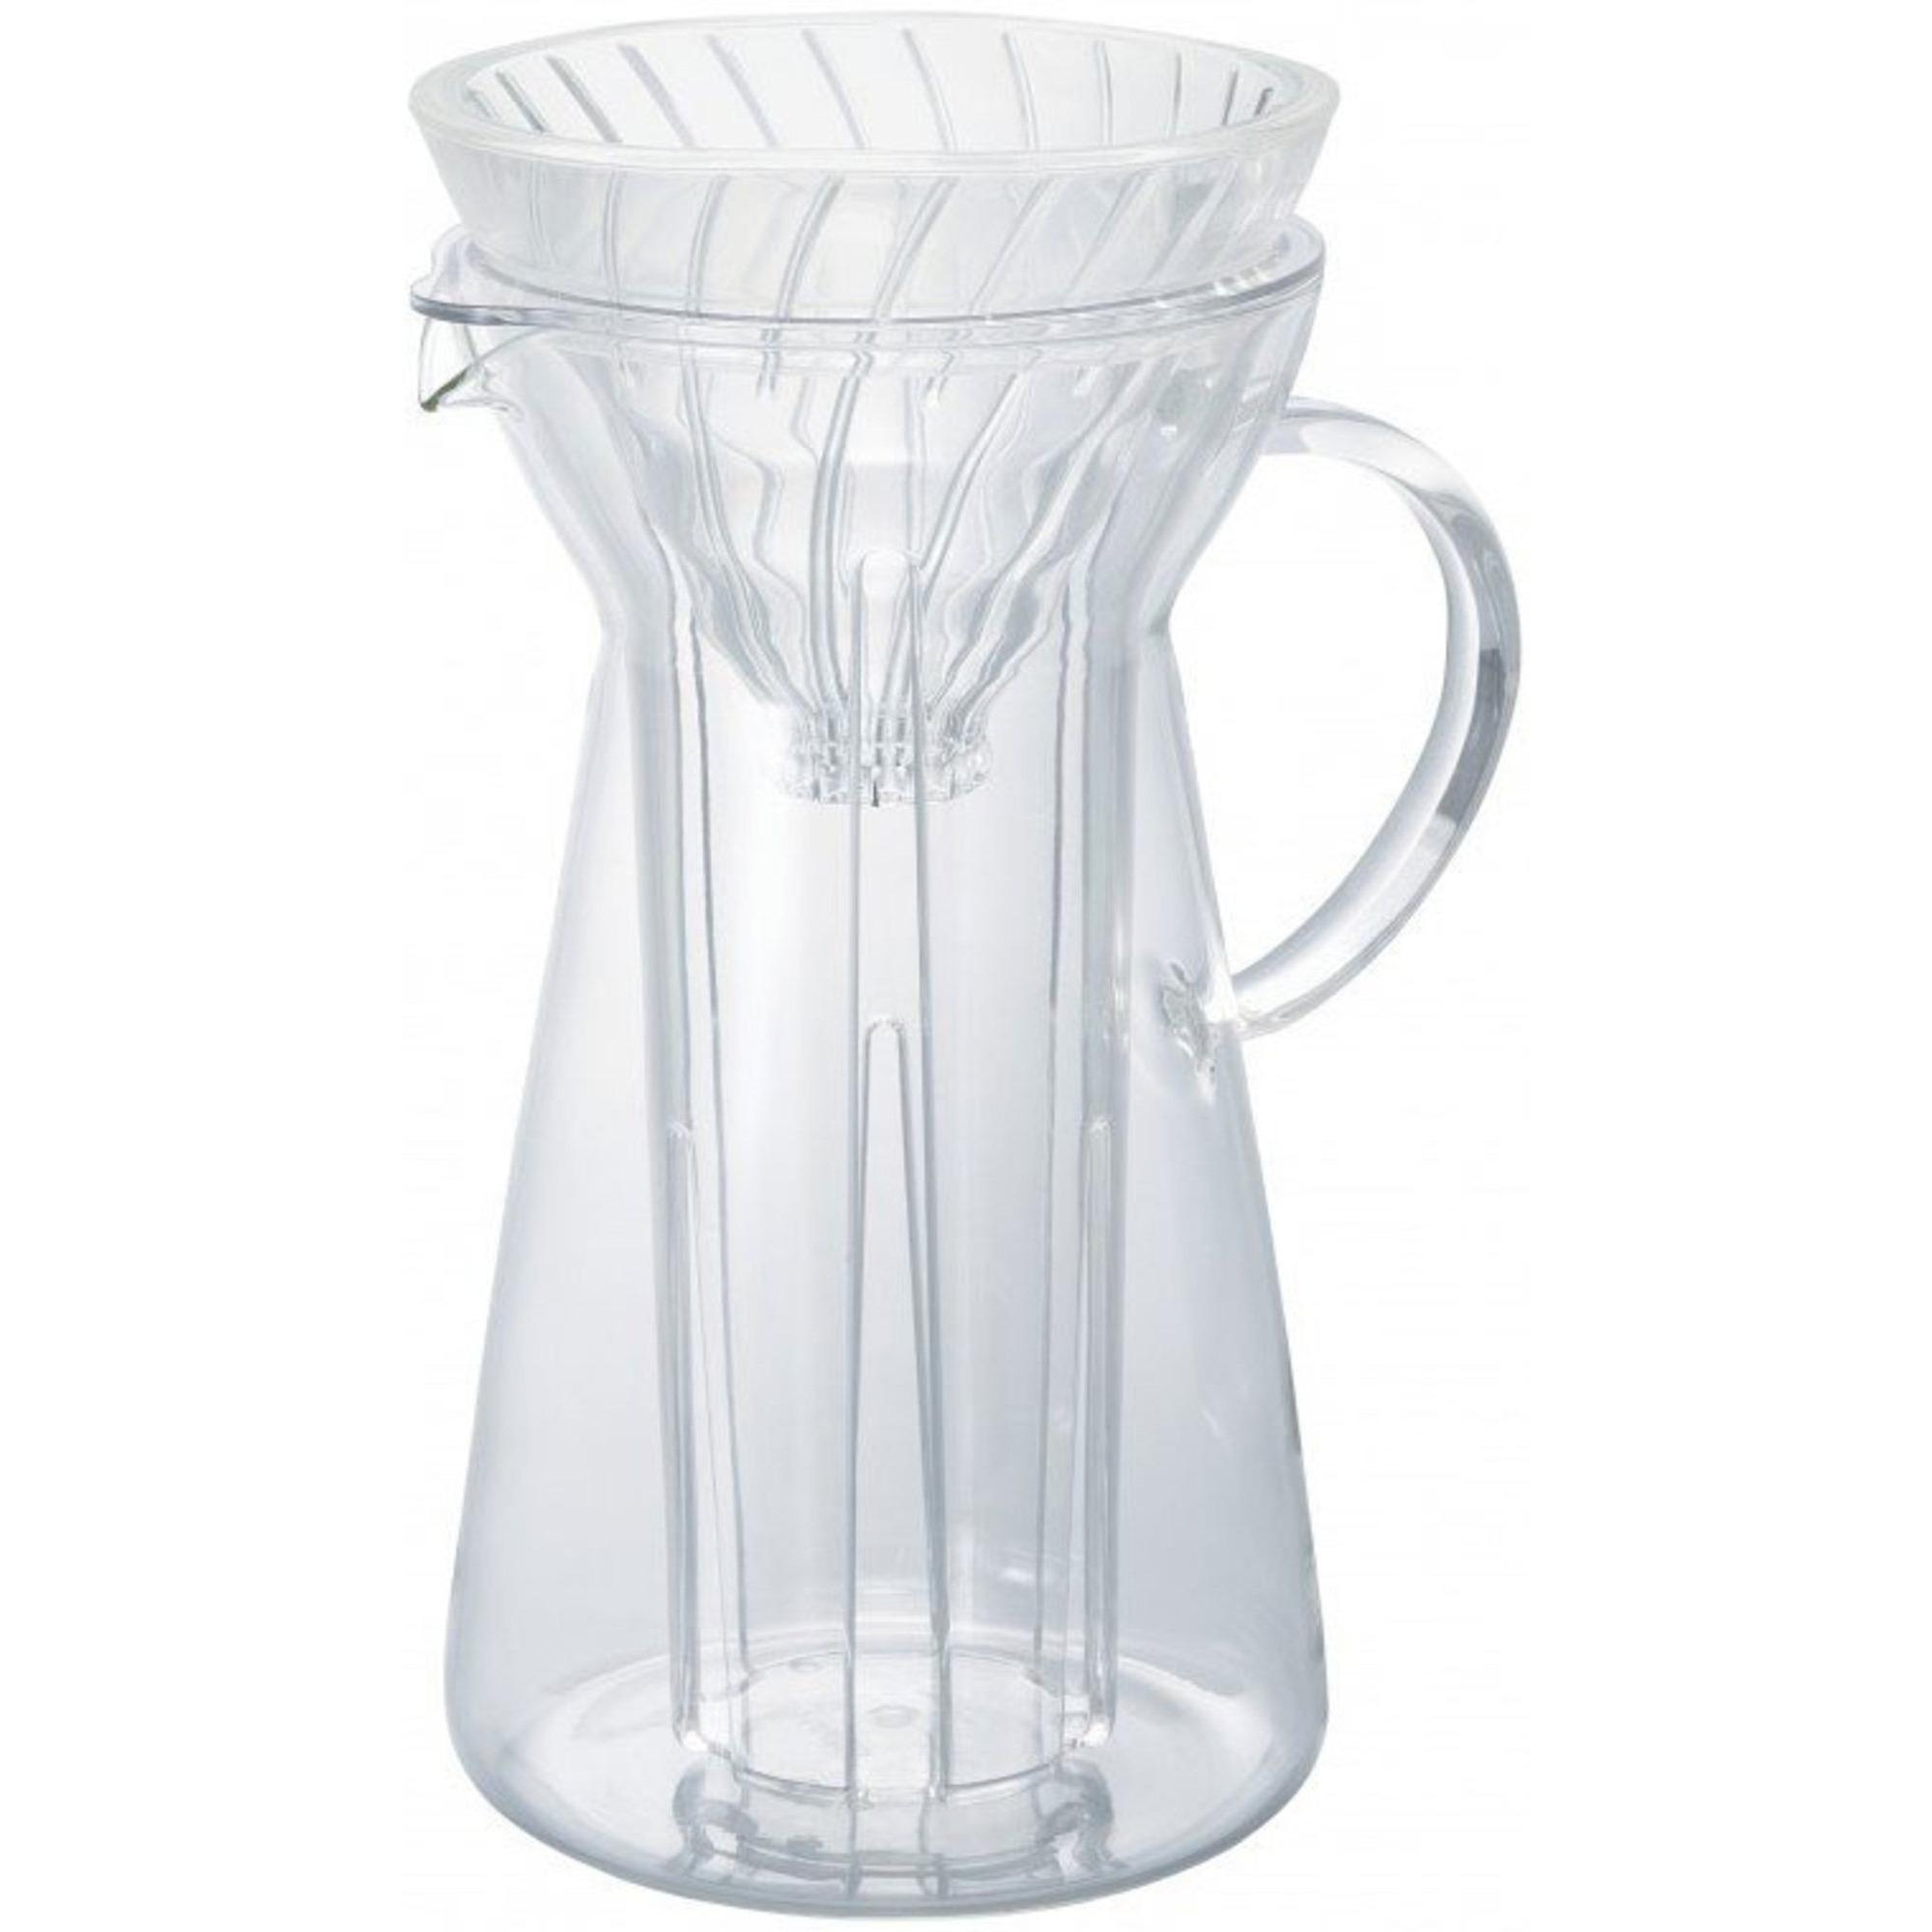 Hario Ice Coffee Maker glass handle